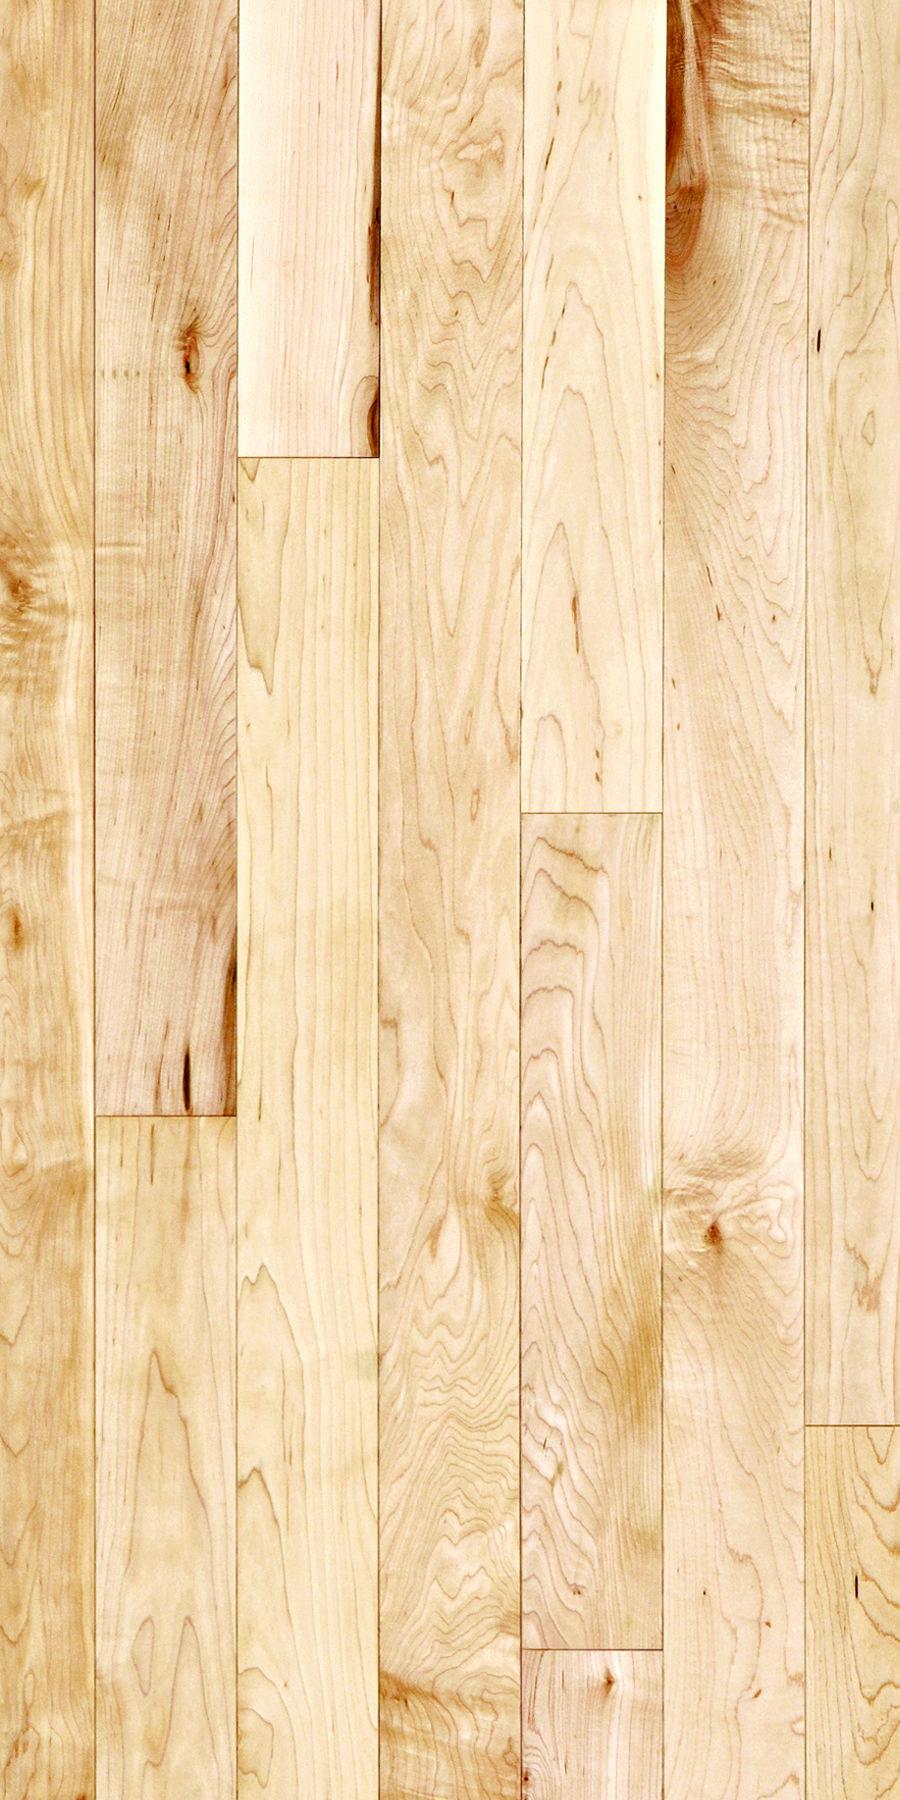 Maine Traditions Hardwood Flooring Classic Collection Hard Maple Coastal Grade Clear Uv Finish Available In 2 1 4 Hardwood Floors Hardwood Rustic Hardwood